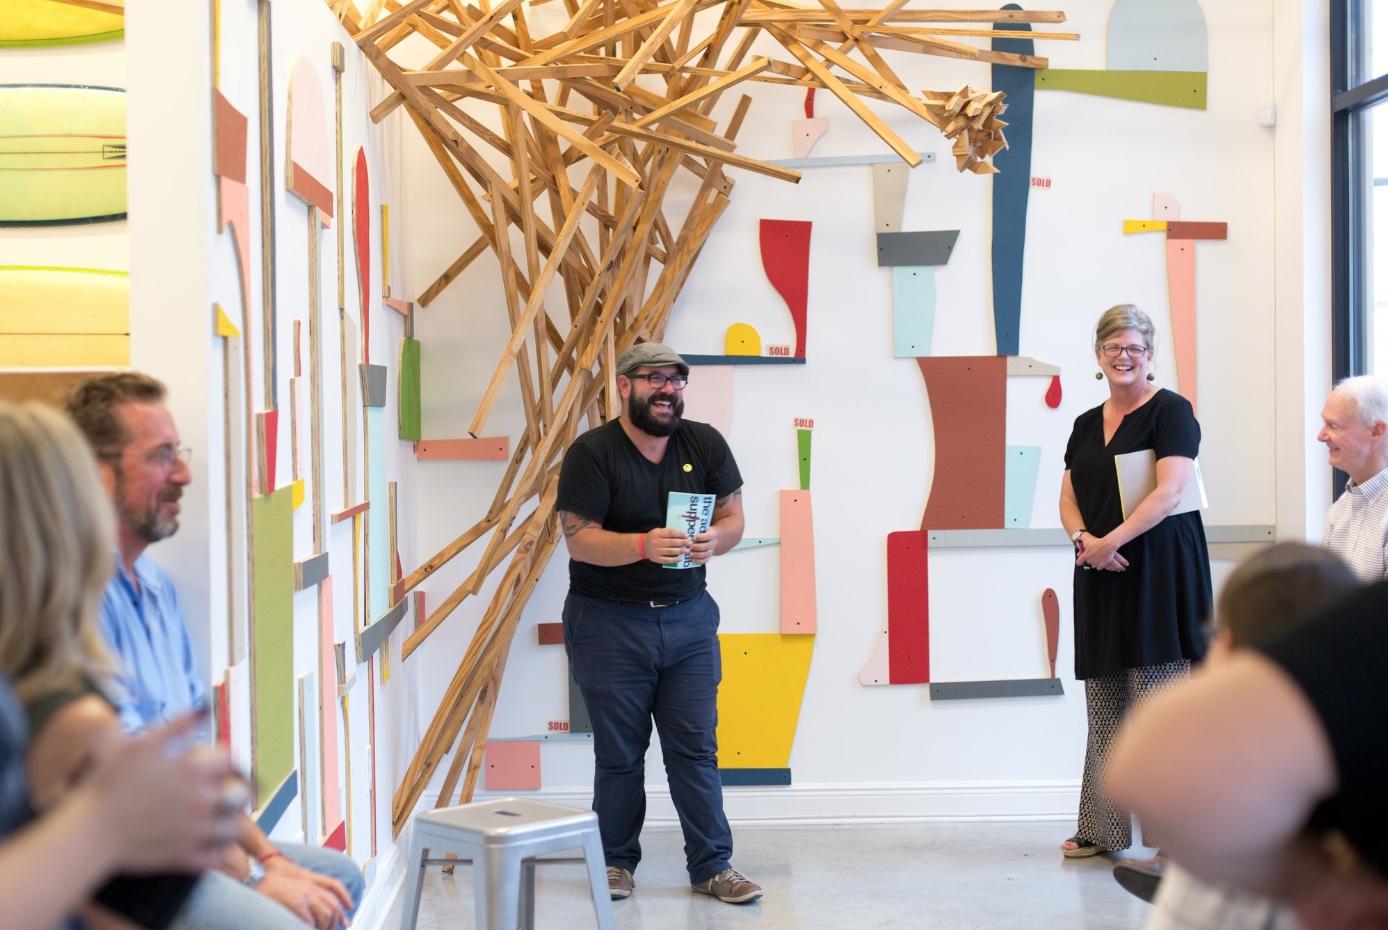 Artist Talk with Ry McCullough Oct 9 | Image, Jaime Aelavanthara